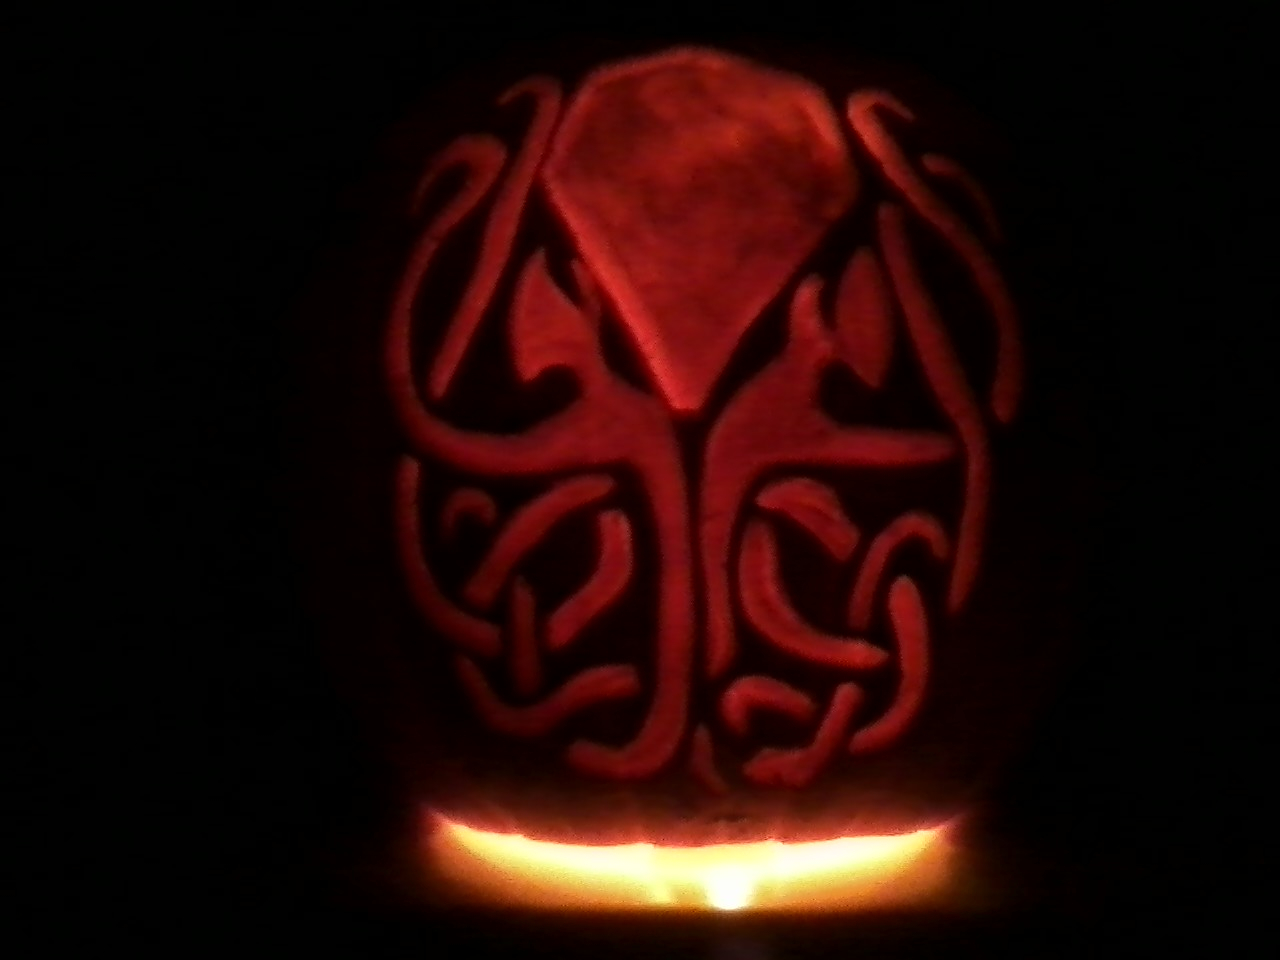 Cthulhu Pumpkin by SithMasterJosh